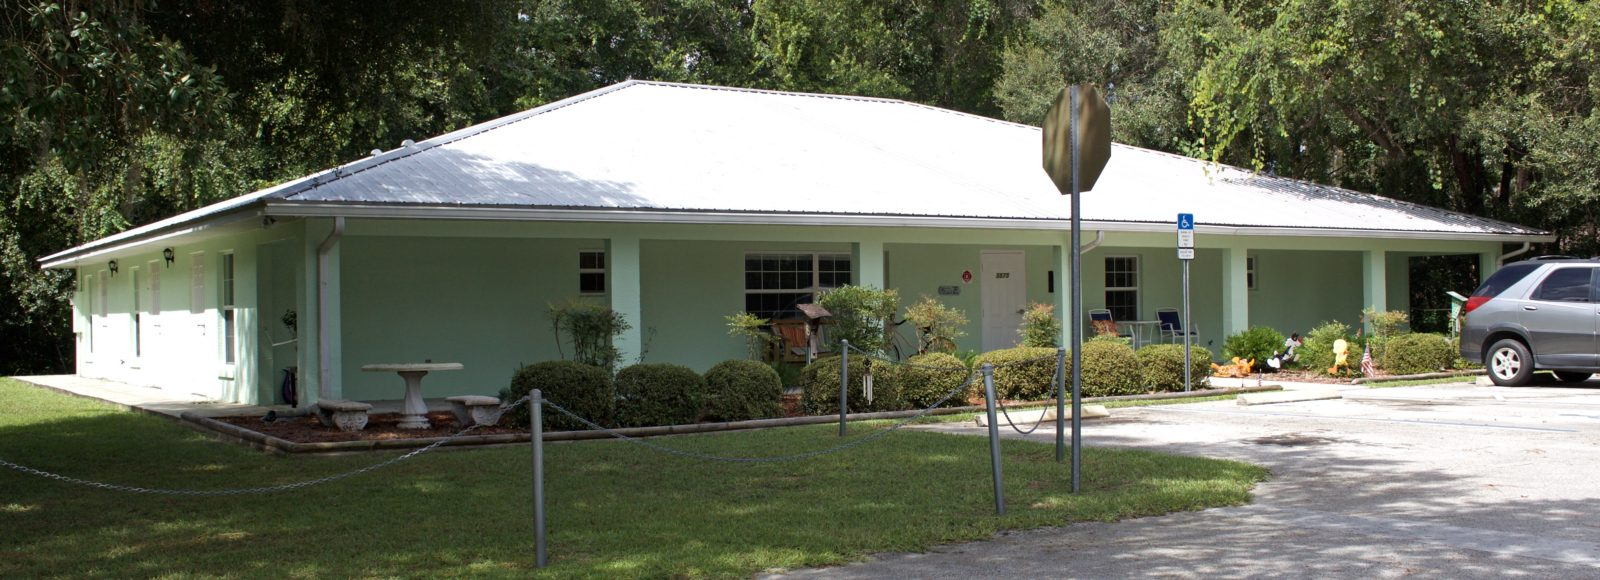 Contento Cottage